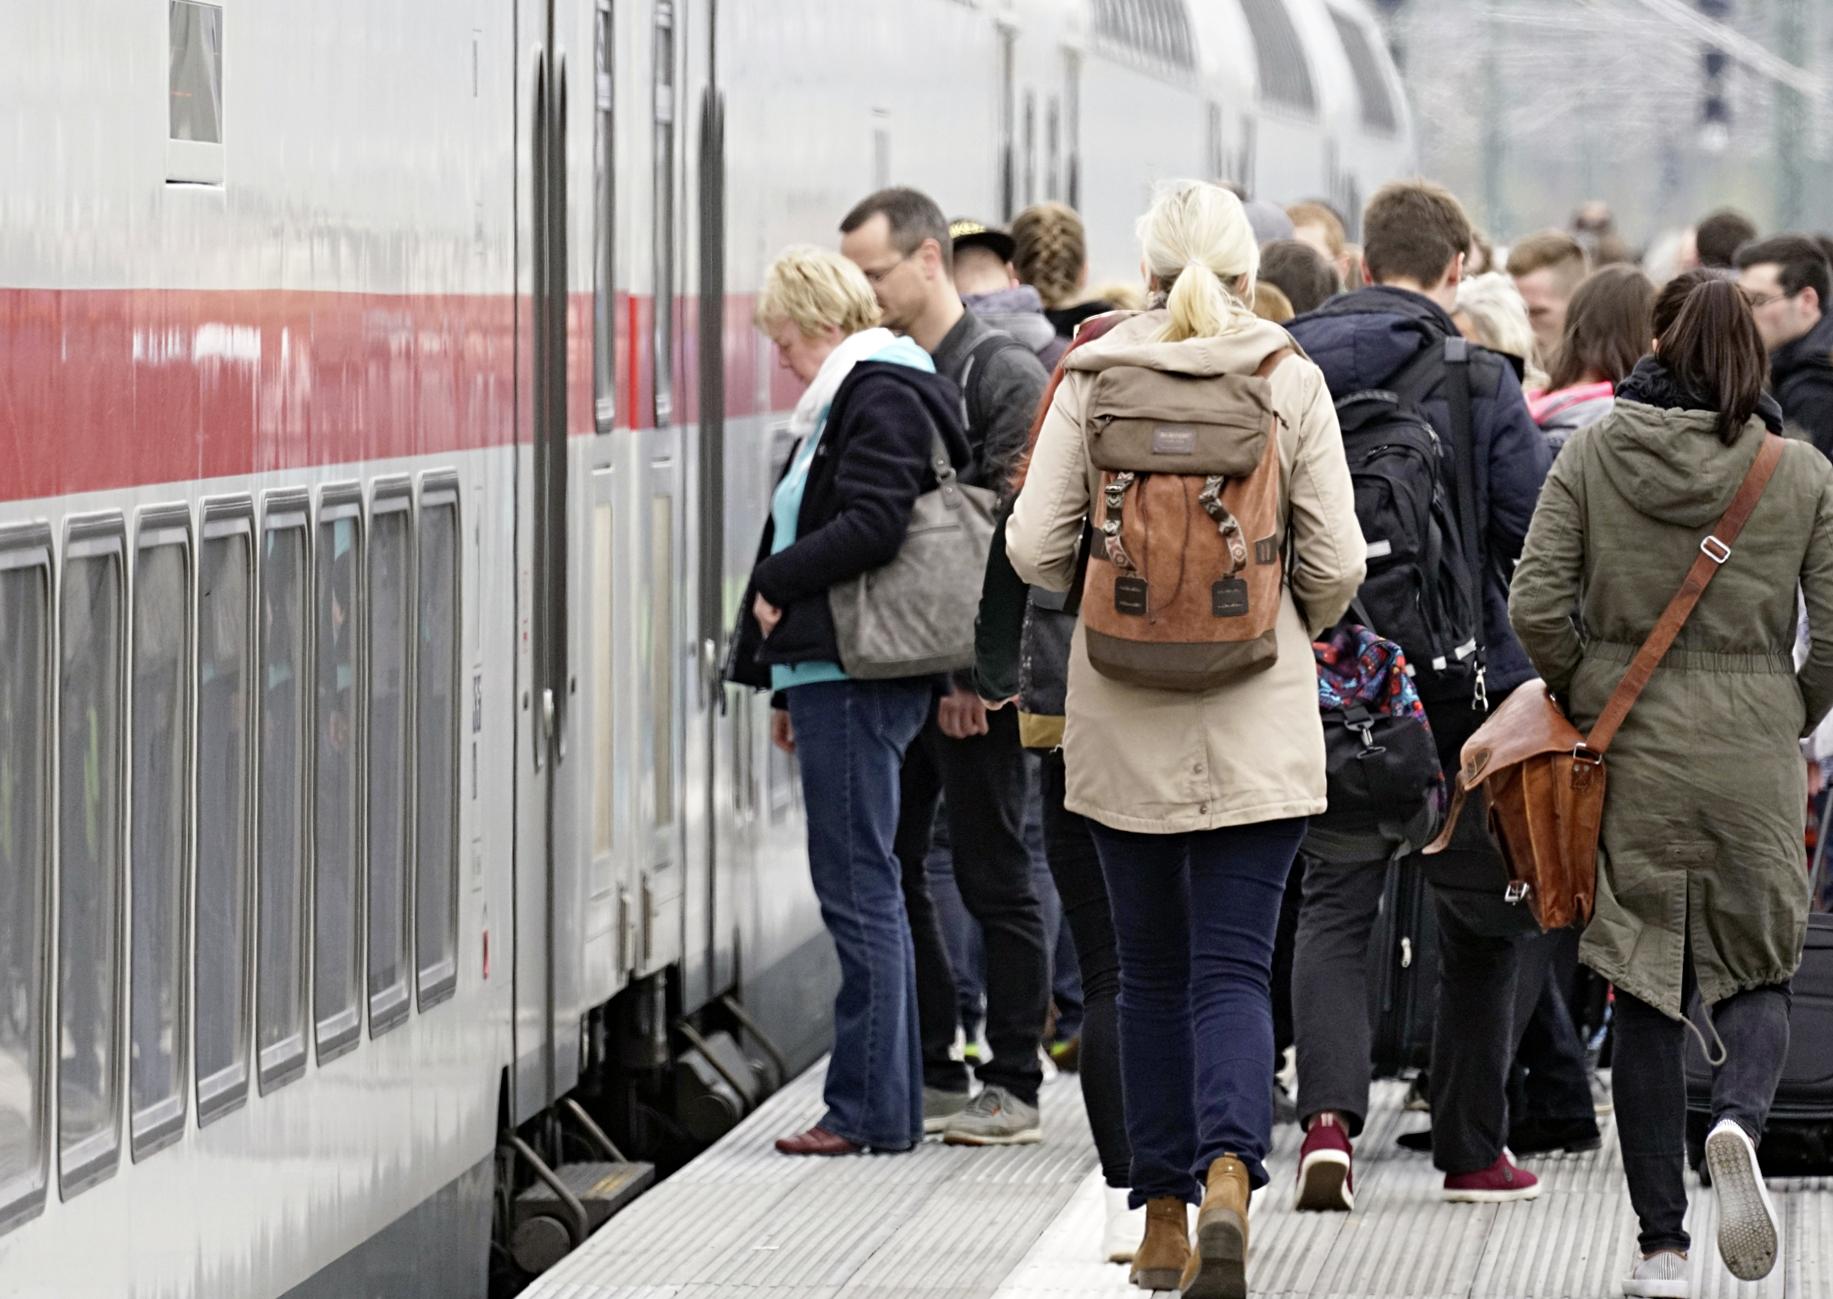 Fahrgäste an einem Bahnsteig im Bahnhof Berlin-Spandau